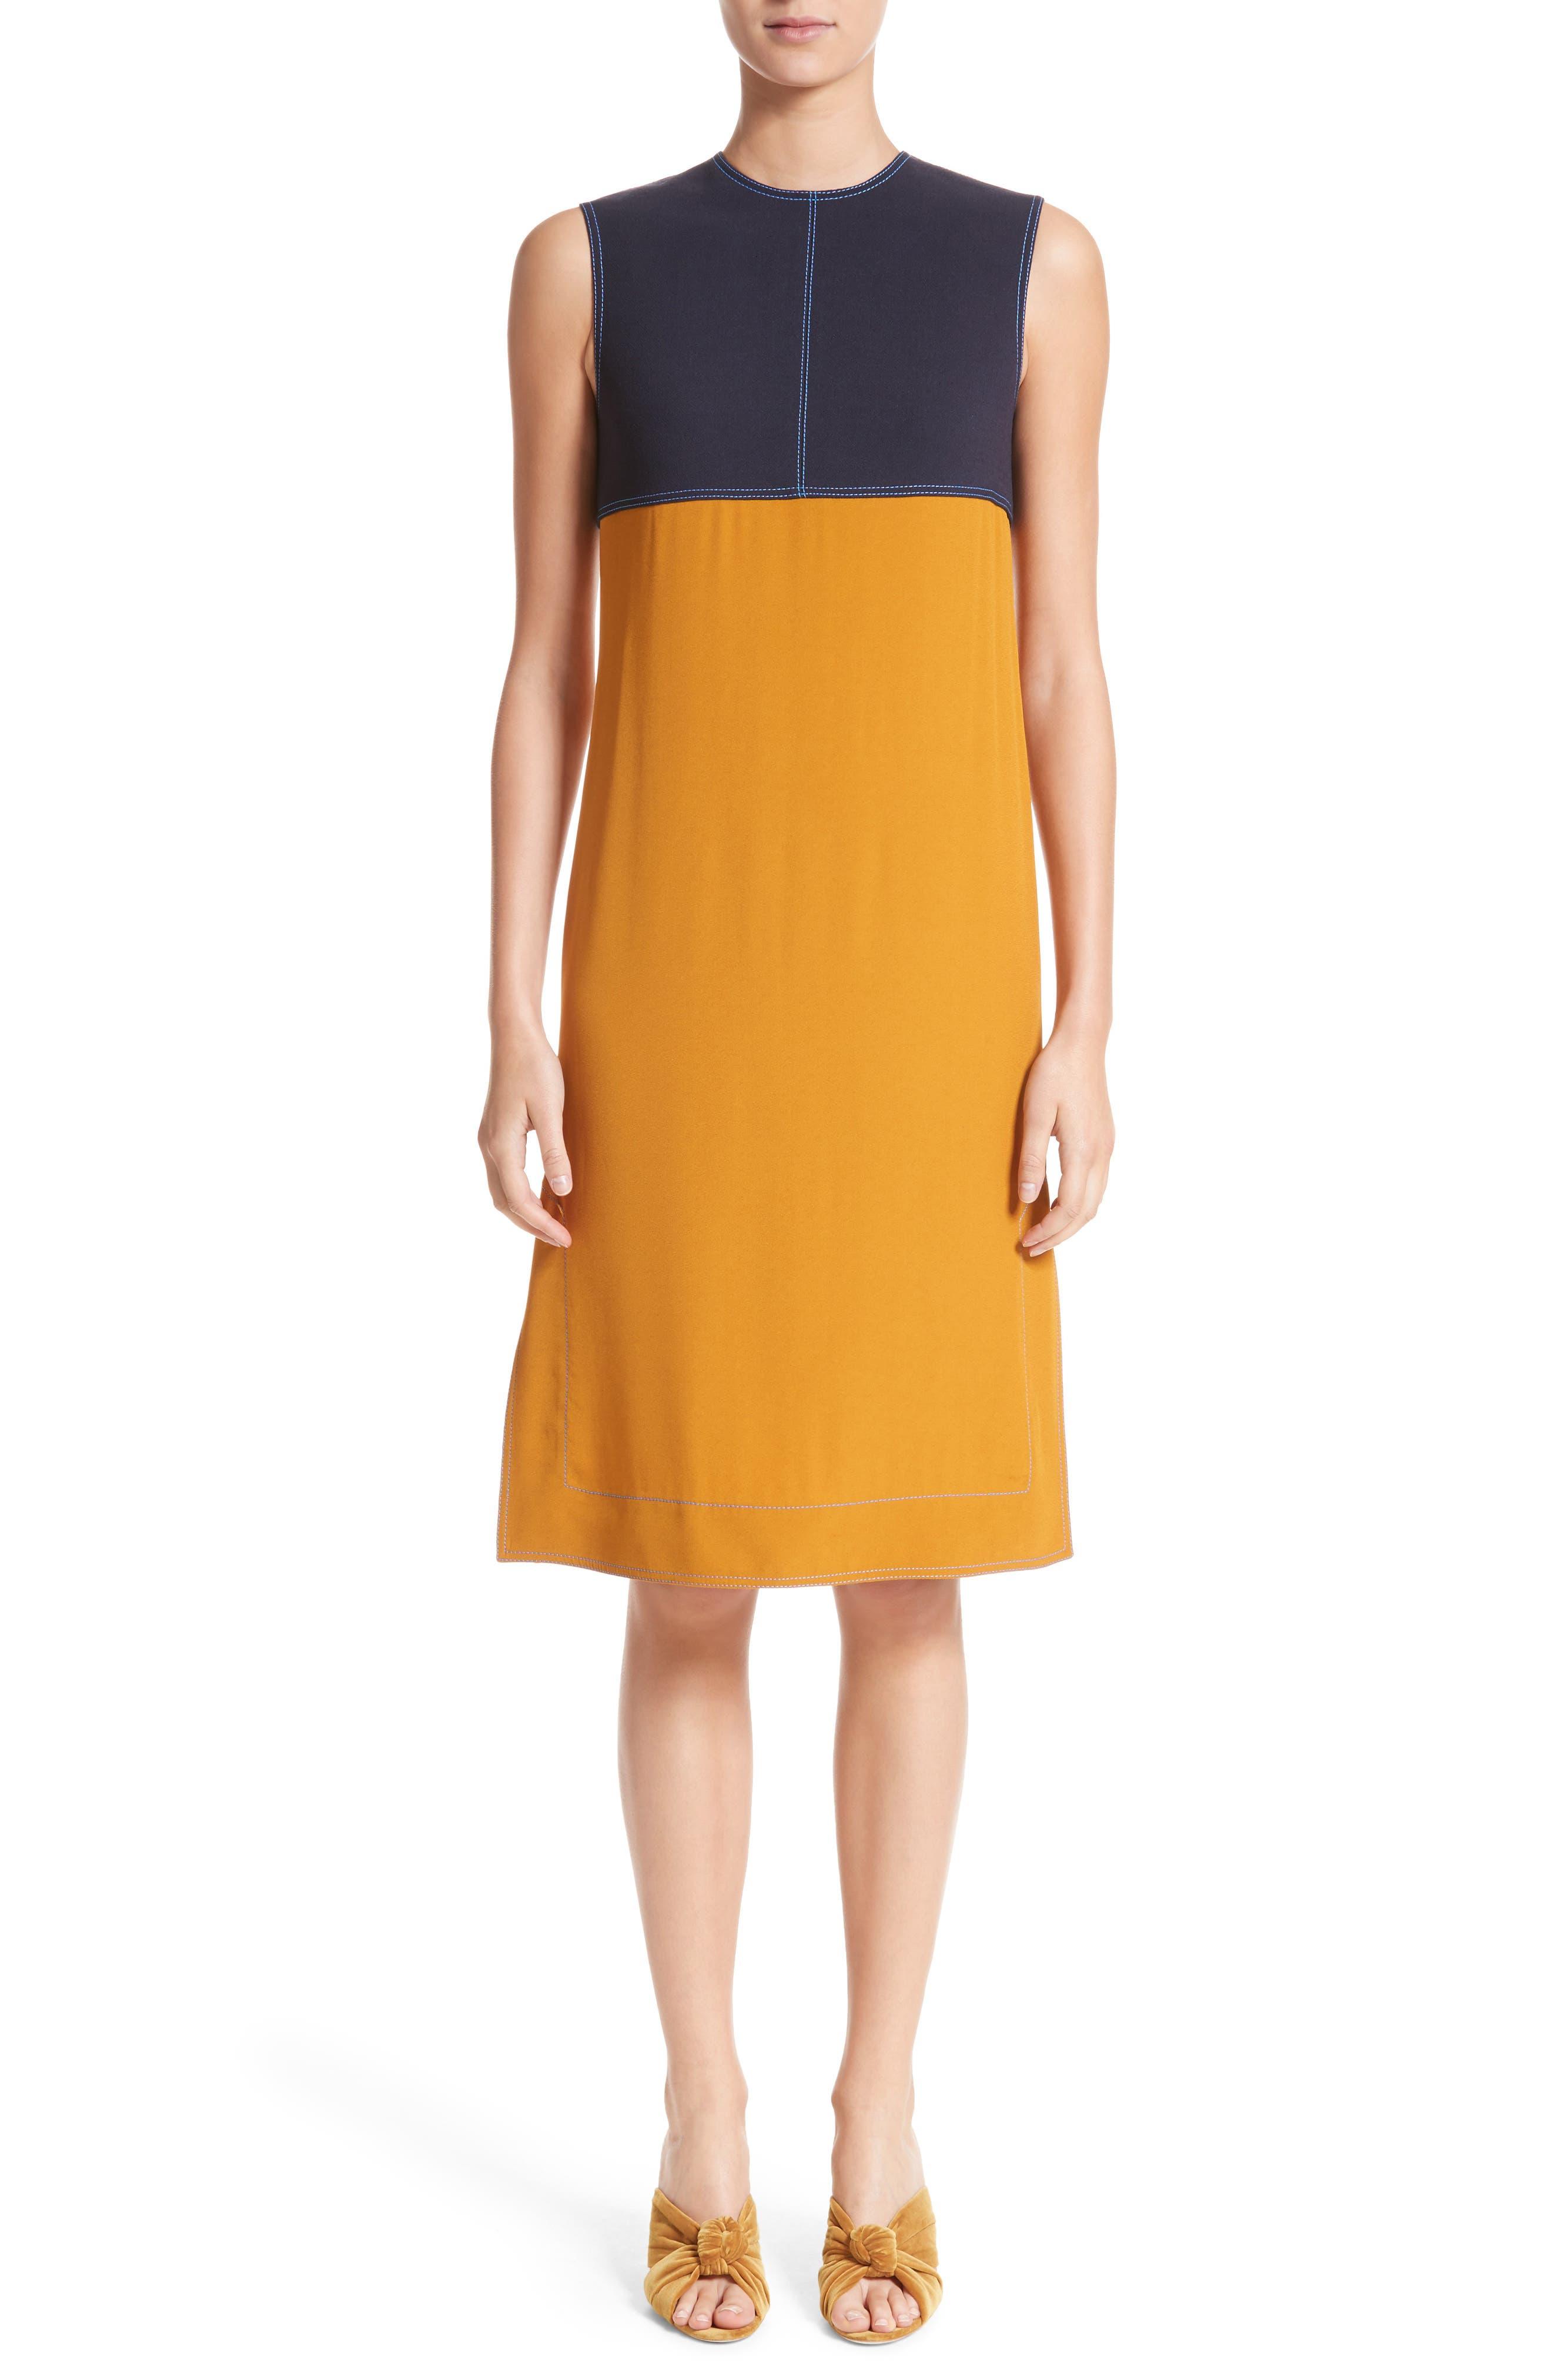 Marni Colorblock Double Face Crepe Dress